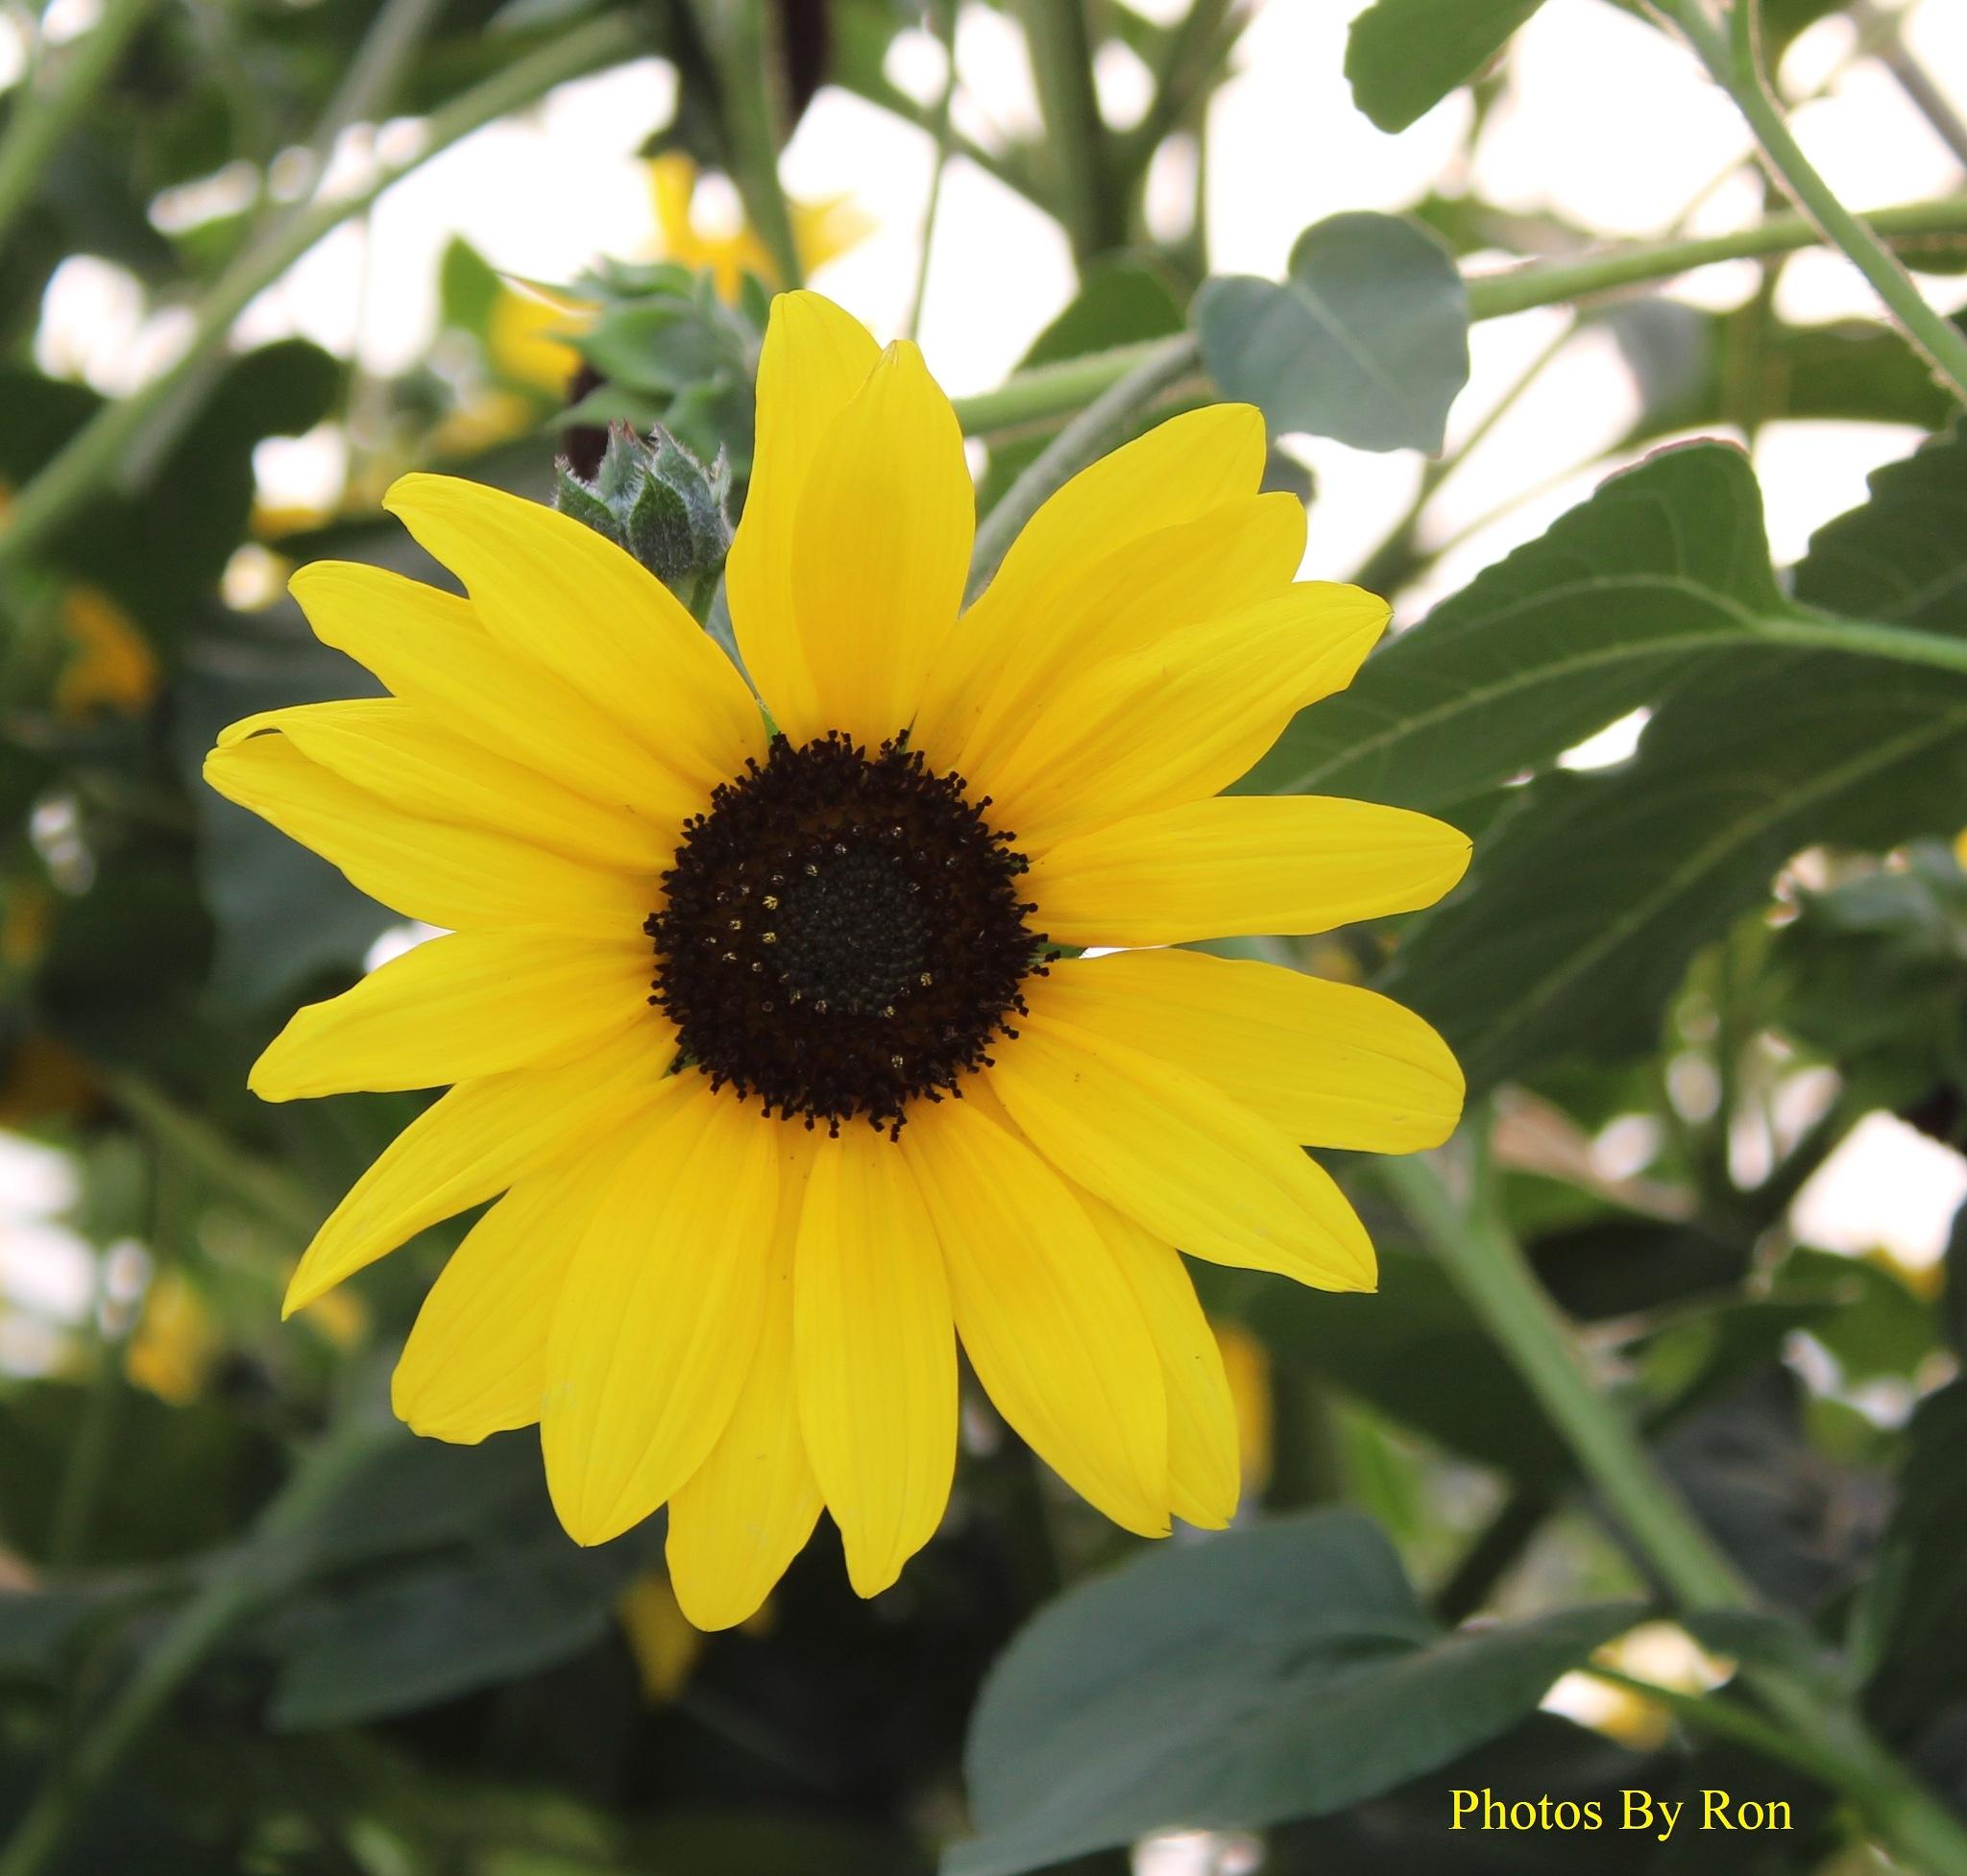 """Sunflower Season"" by Ron Berkley"